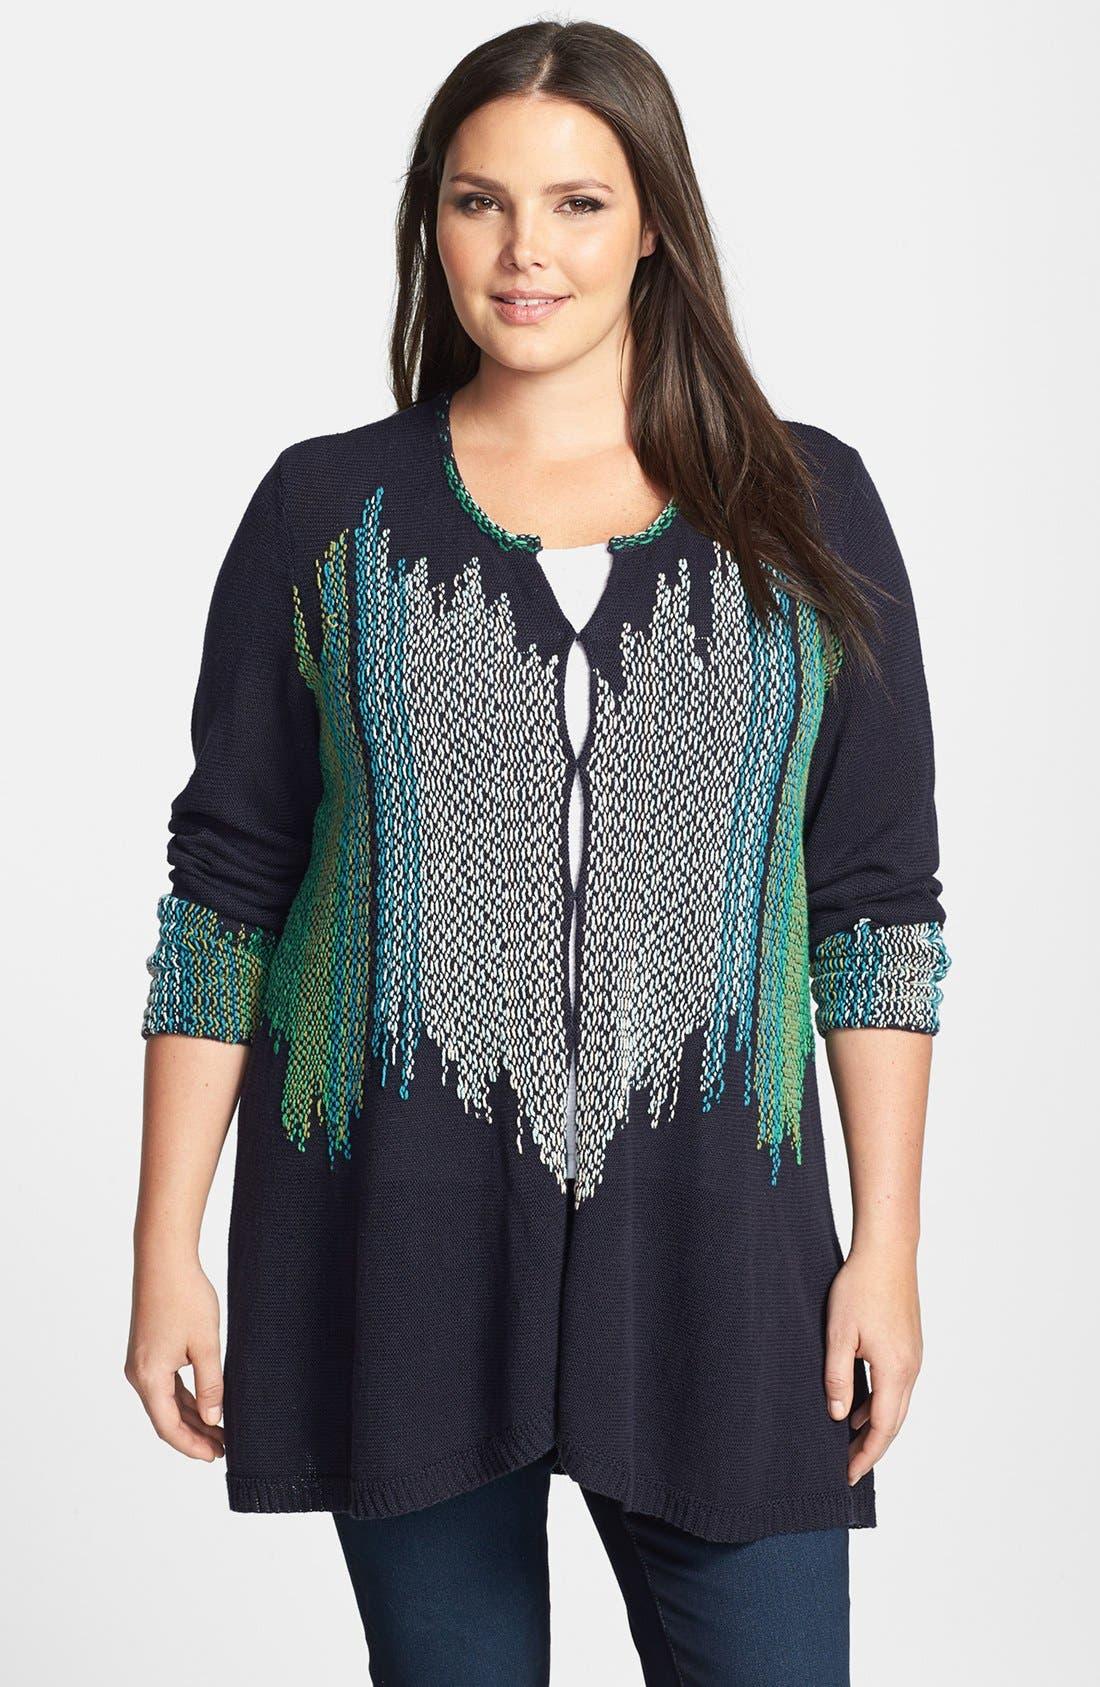 Main Image - NIC+ZOE 'Color Weave' Cardigan (Plus Size)